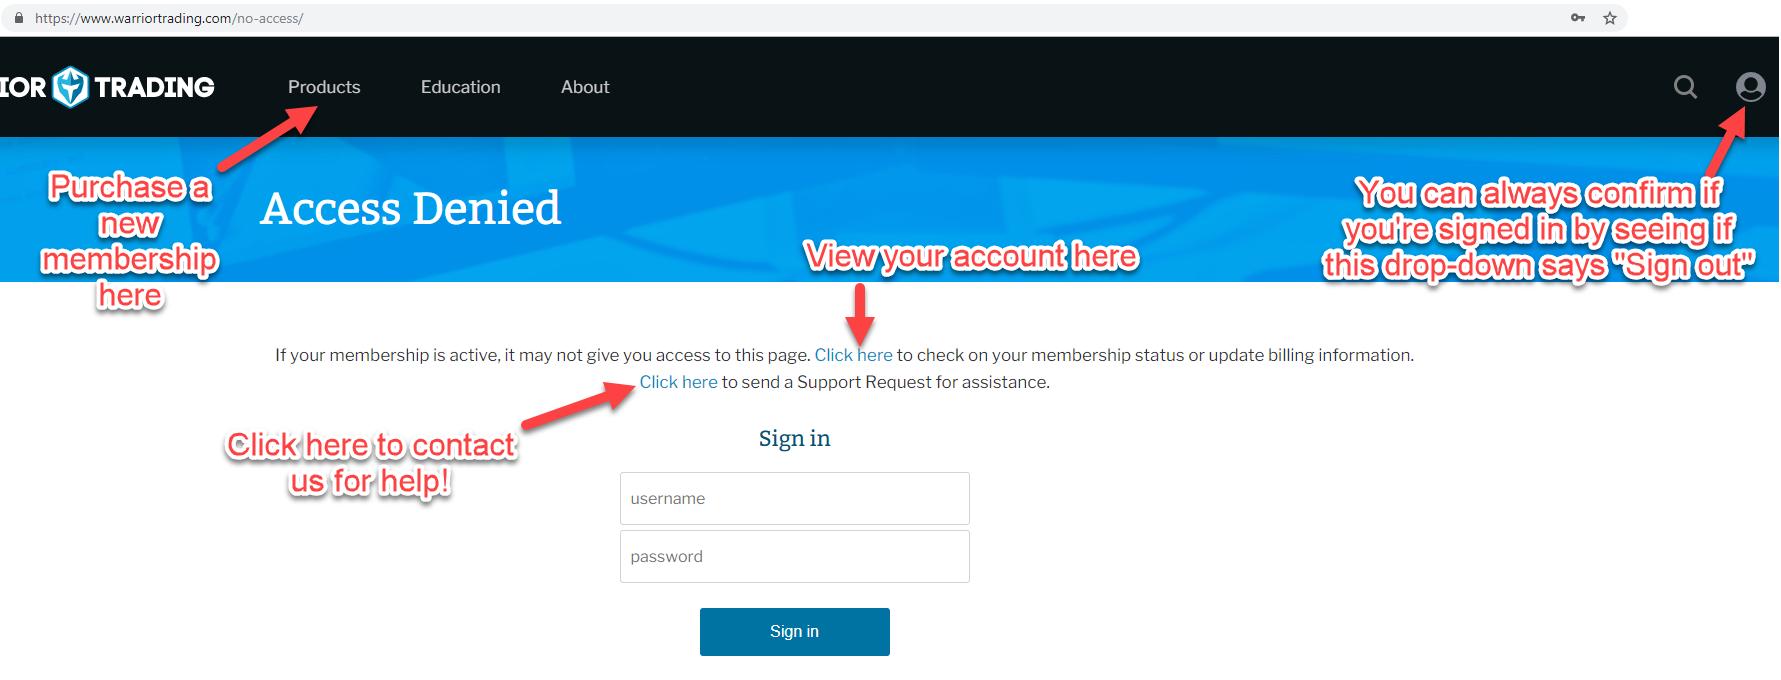 Access Denied Website Error - My Own Email